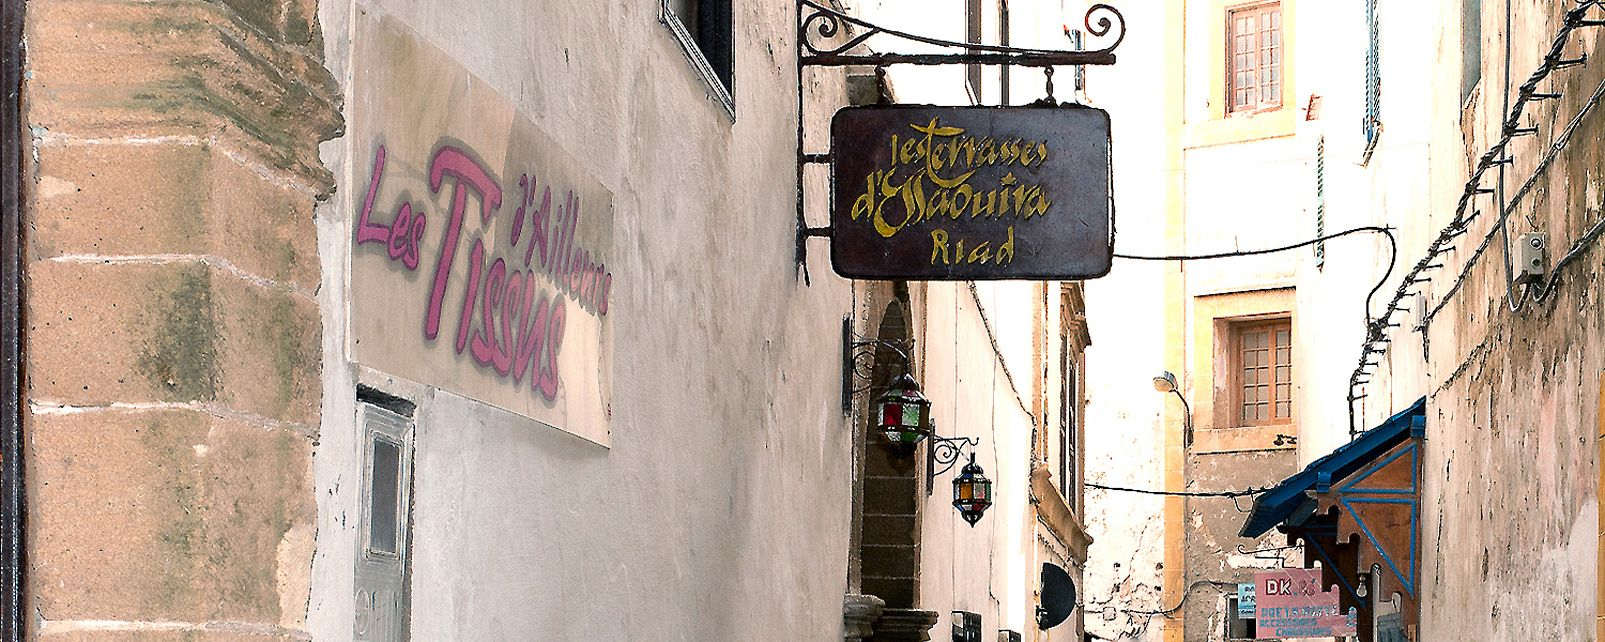 Hotel Les Terrasses d'Essaouira